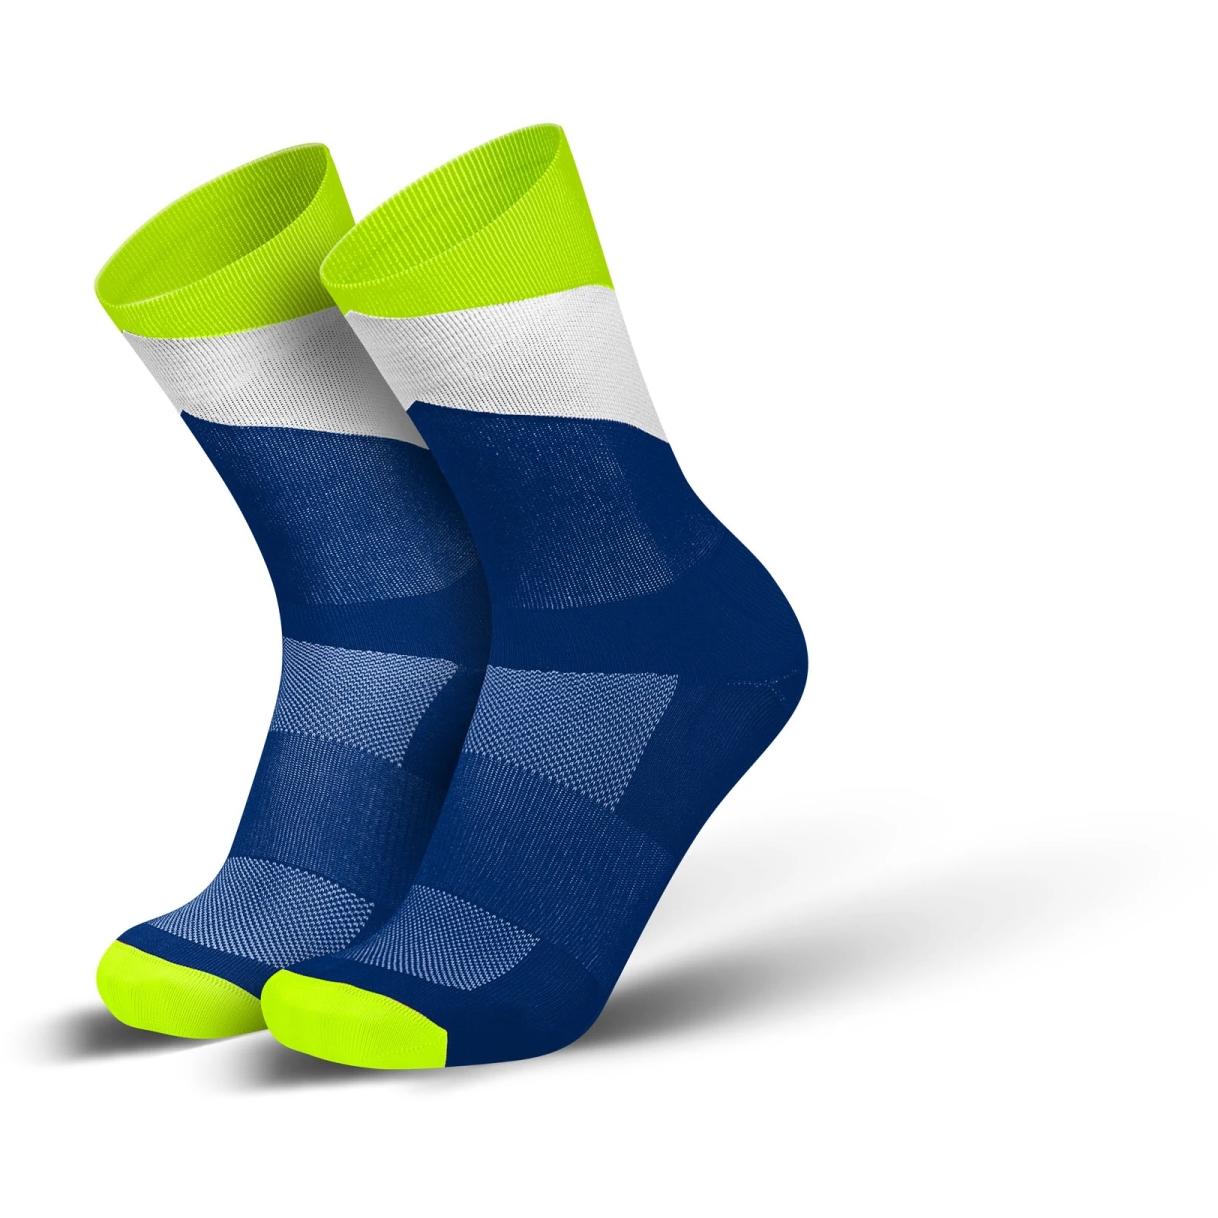 Produktbild von INCYLENCE Ultralight Arrows Socken - Canary